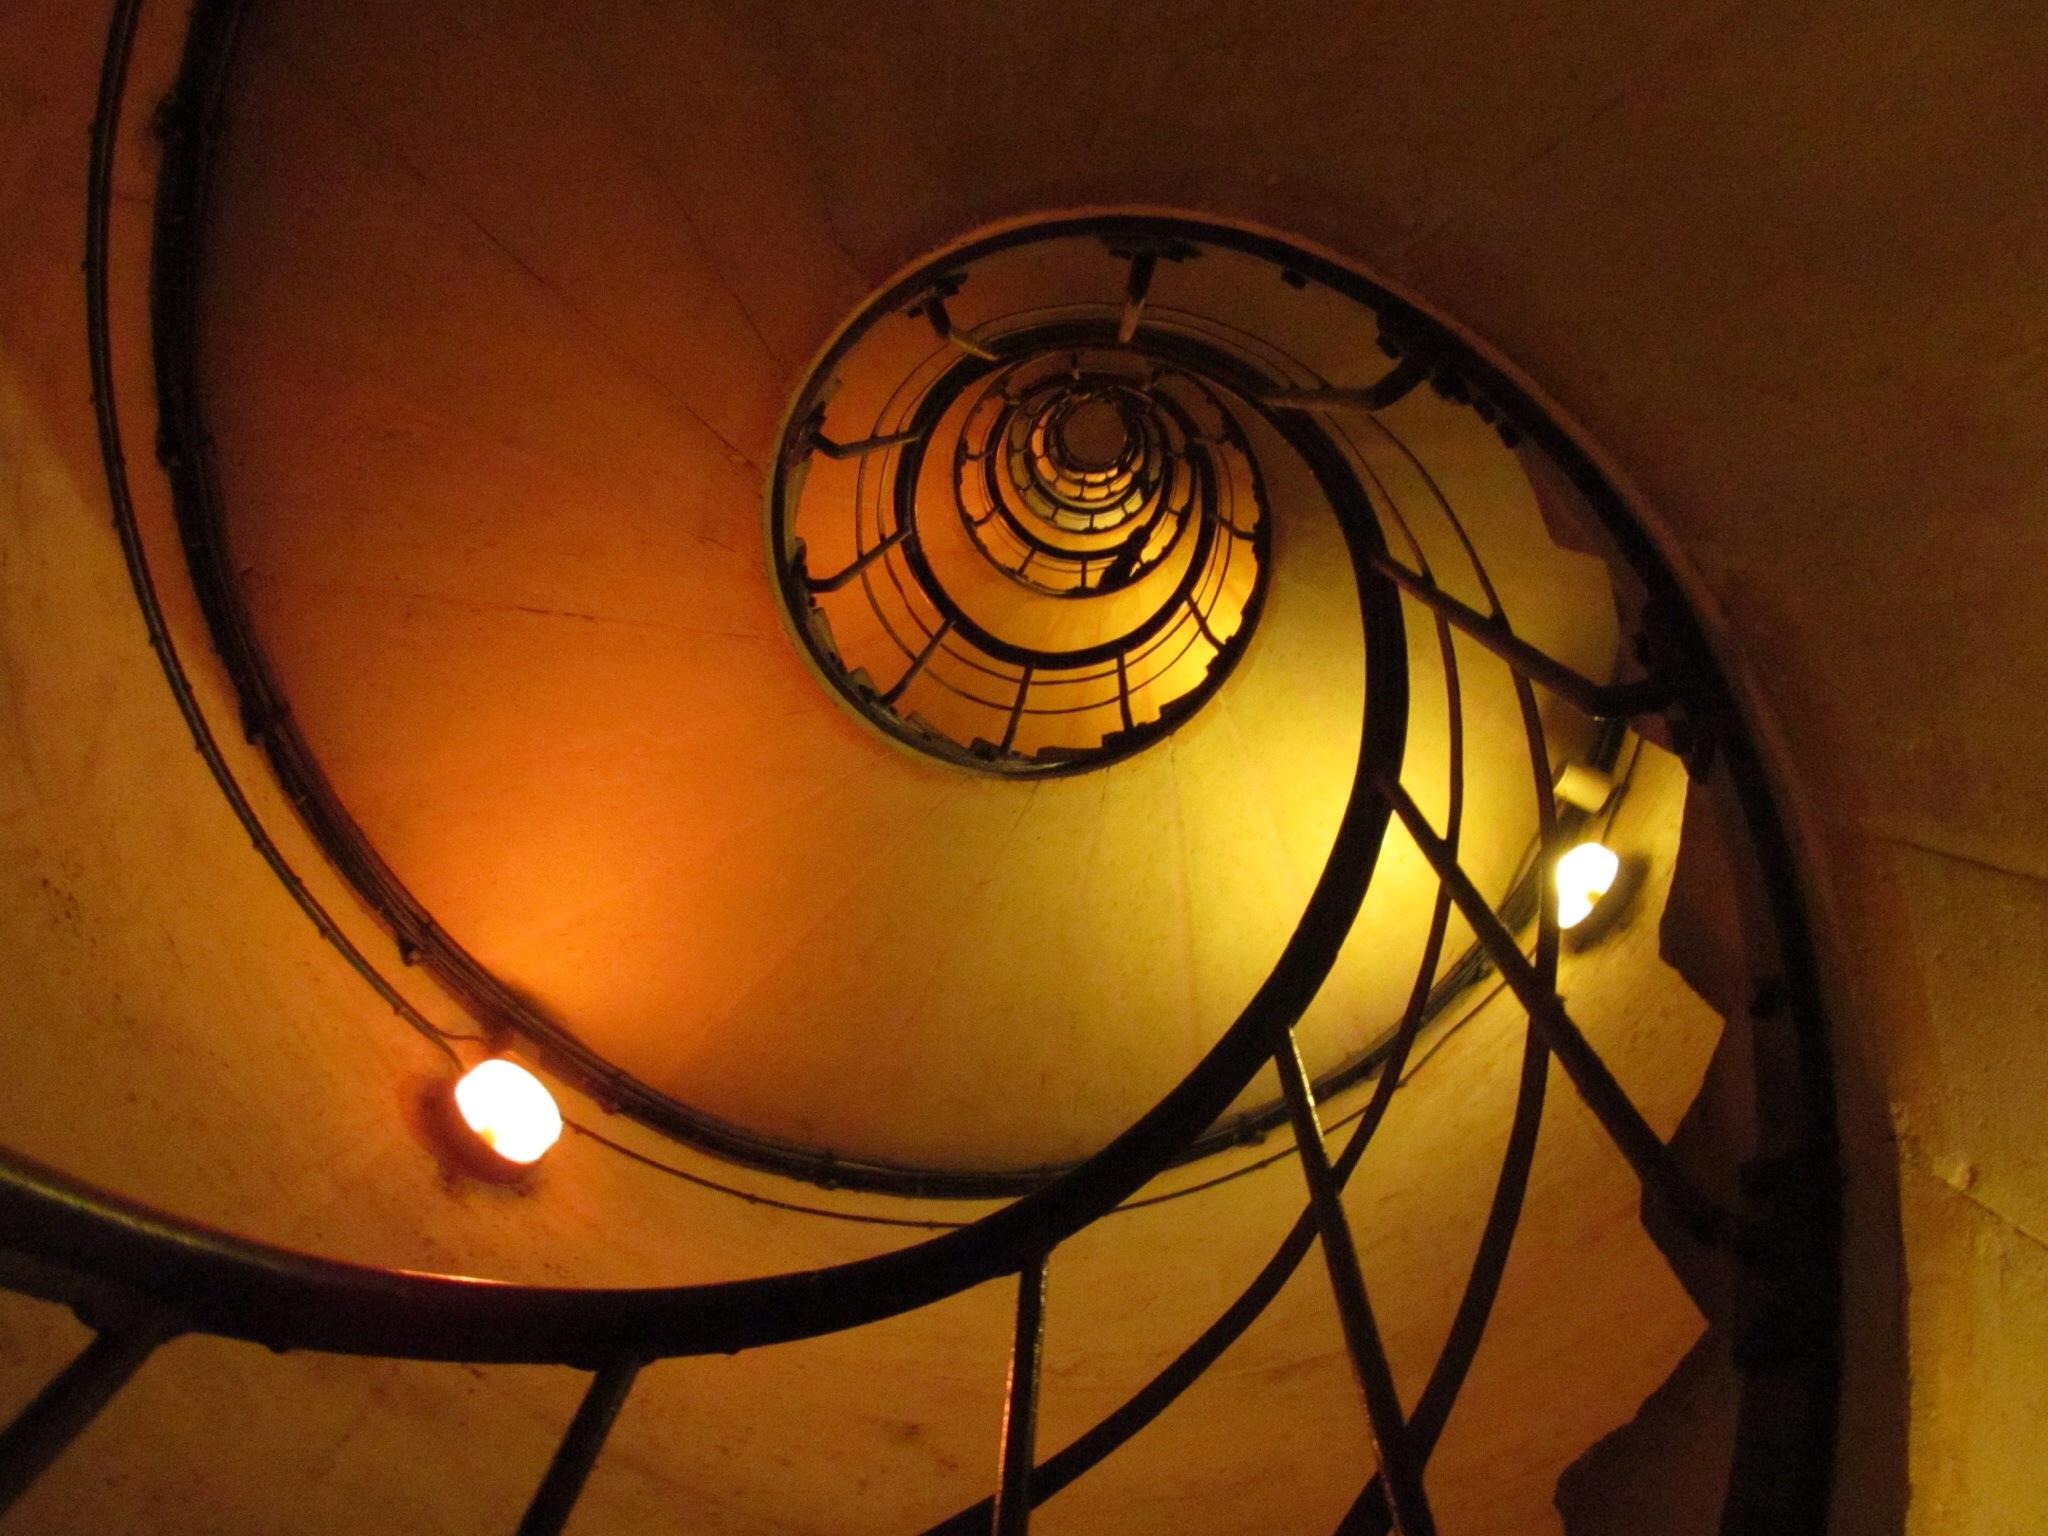 Staircase in the Arc de Triomphe, Paris. Image Credit Mack444 (via Flickr)